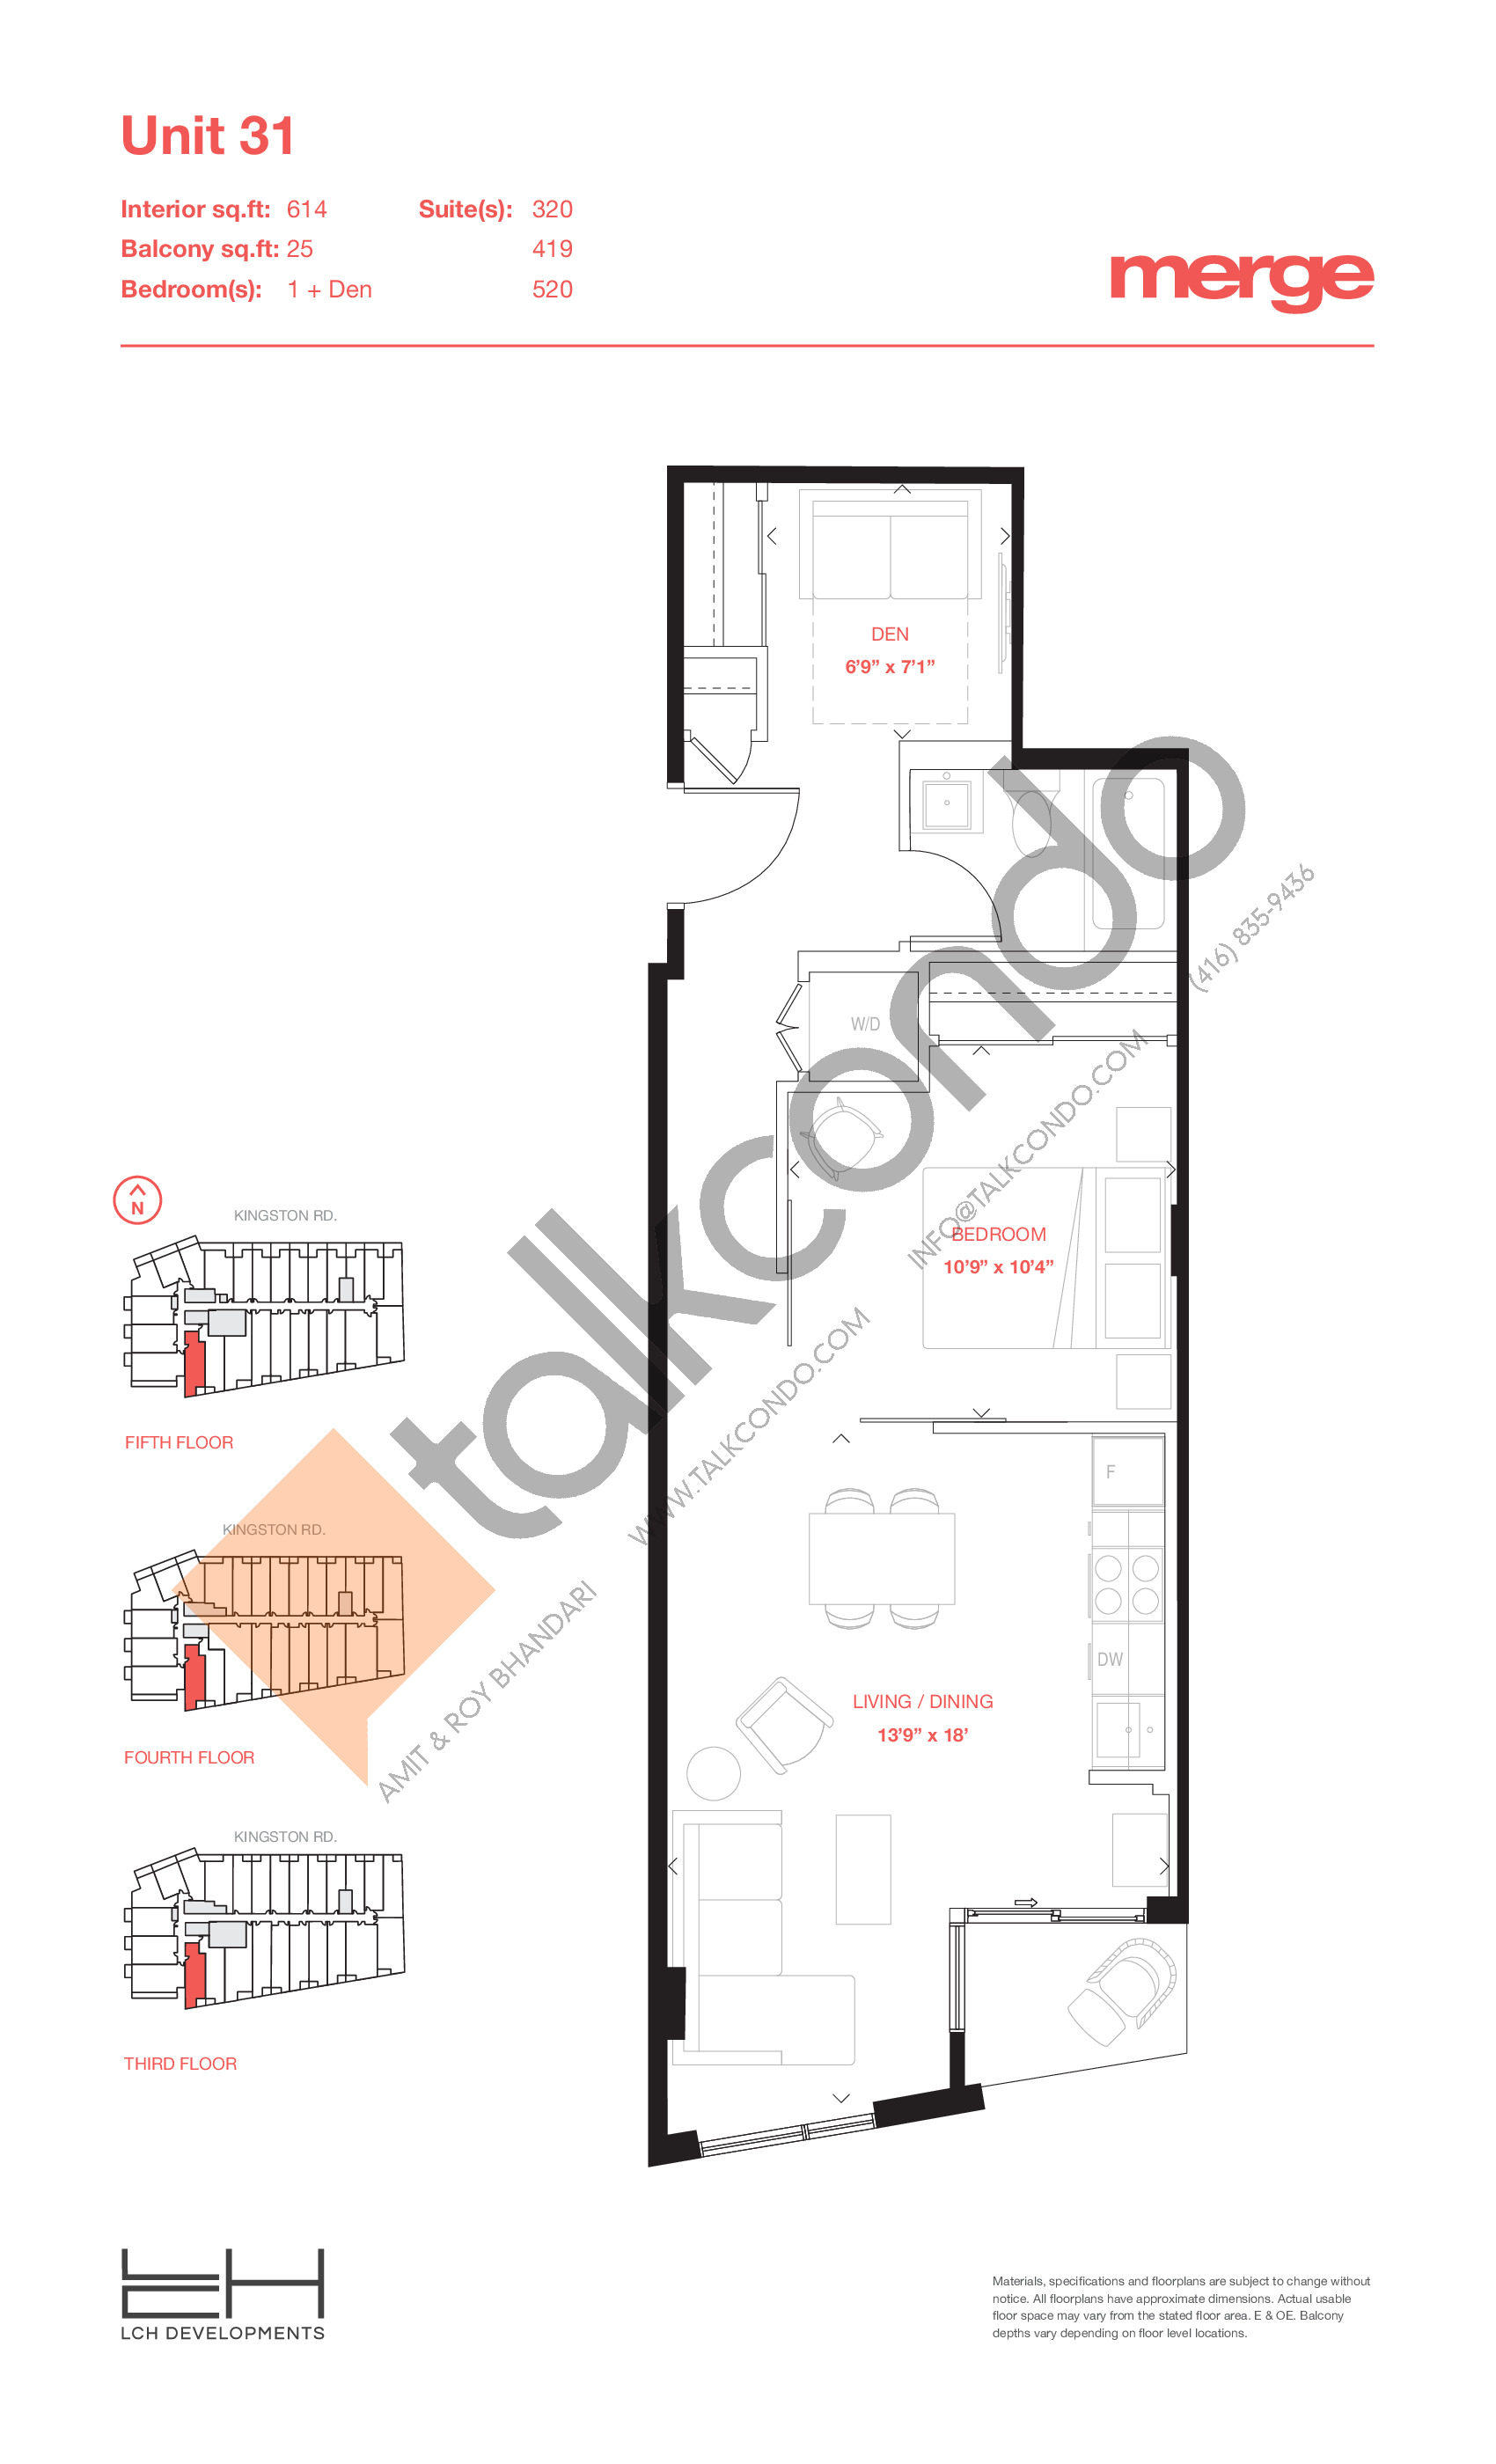 Unit 31 - Tower Floor Plan at Merge Condos - 614 sq.ft